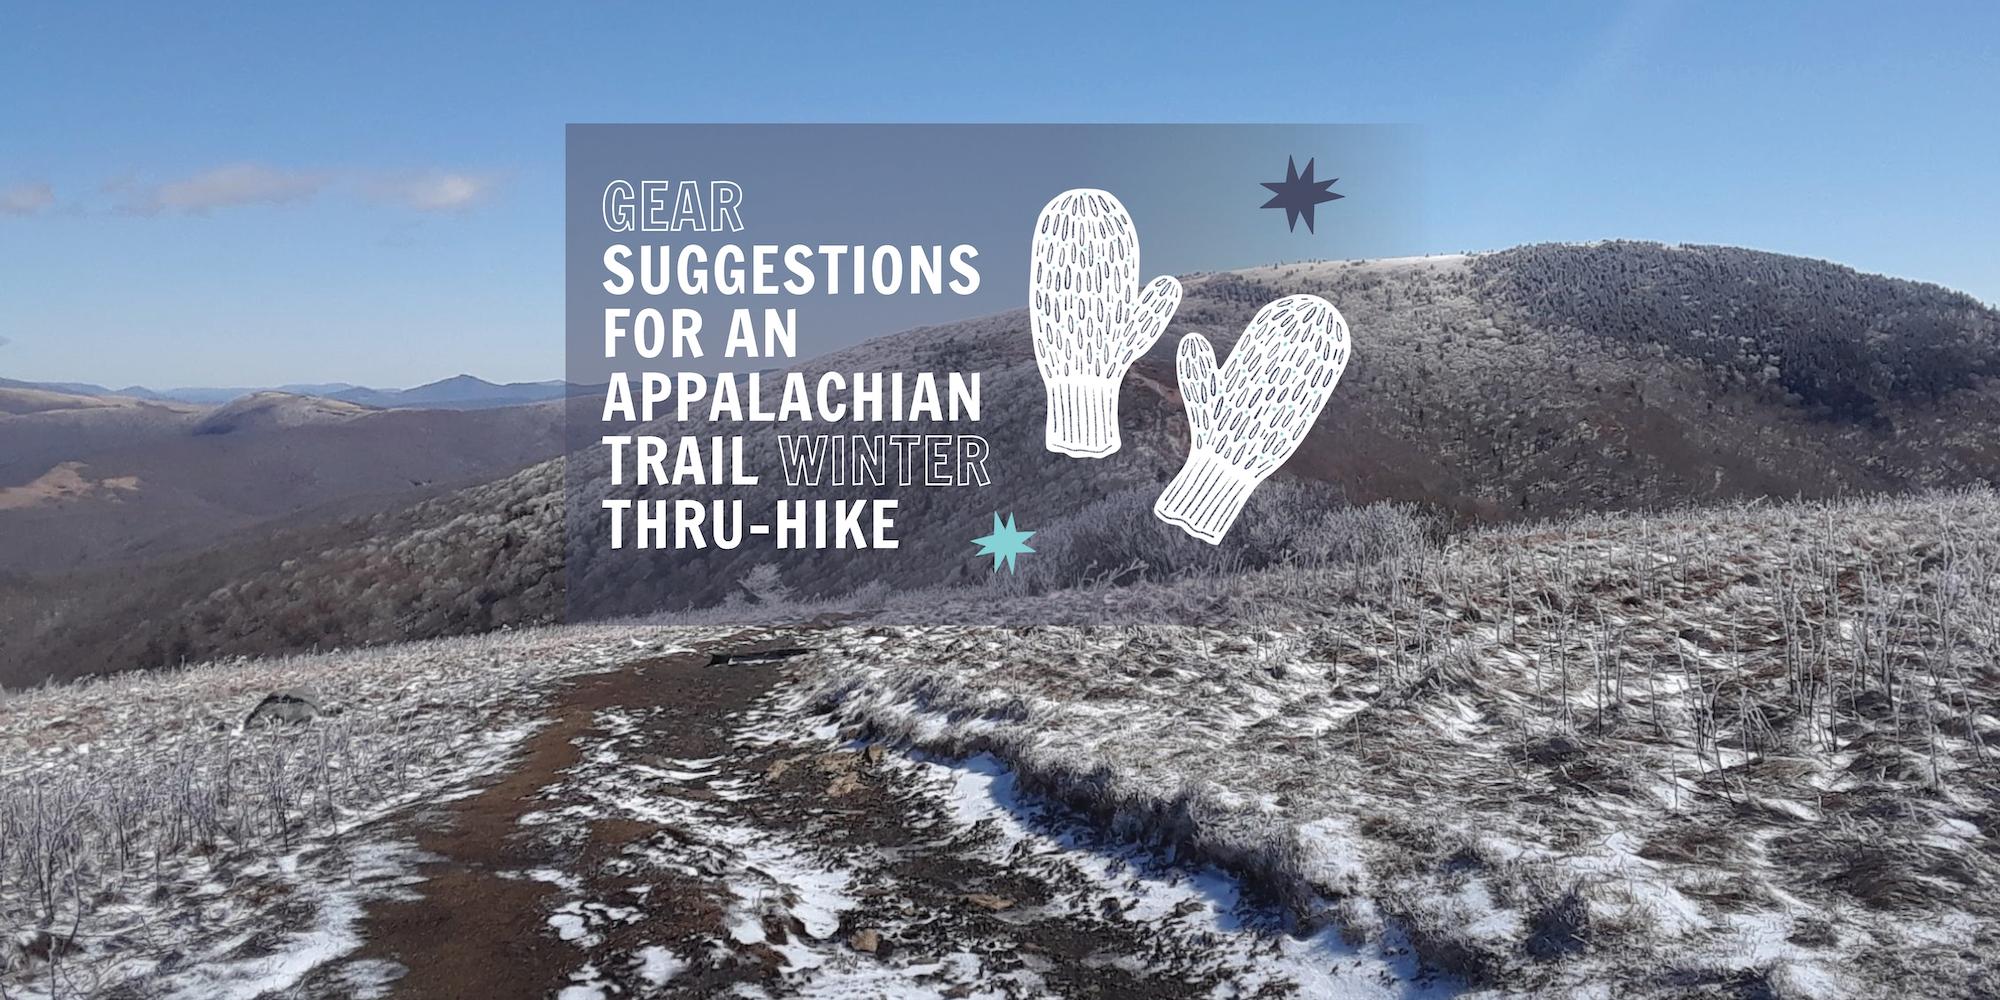 Gear Suggestions for an Appalachian Trail Winter Thru-Hike